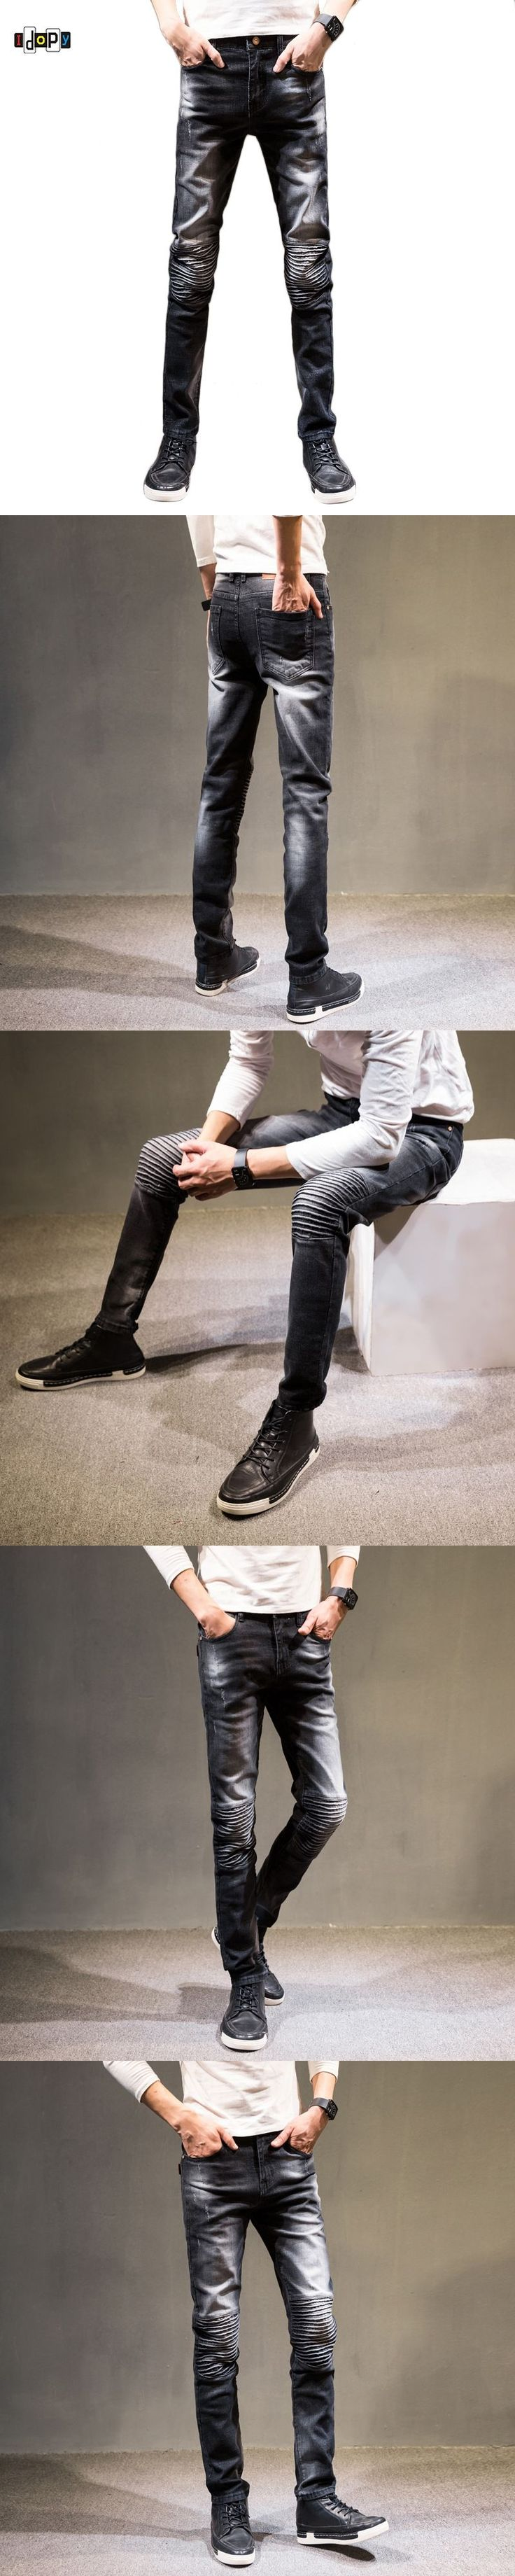 Idopy Men`s Ripped Biker Jeans Vintage Acid Washed Slim Fit Super Skinny Stretchy Denim Pants Pencil Jeans For Youth